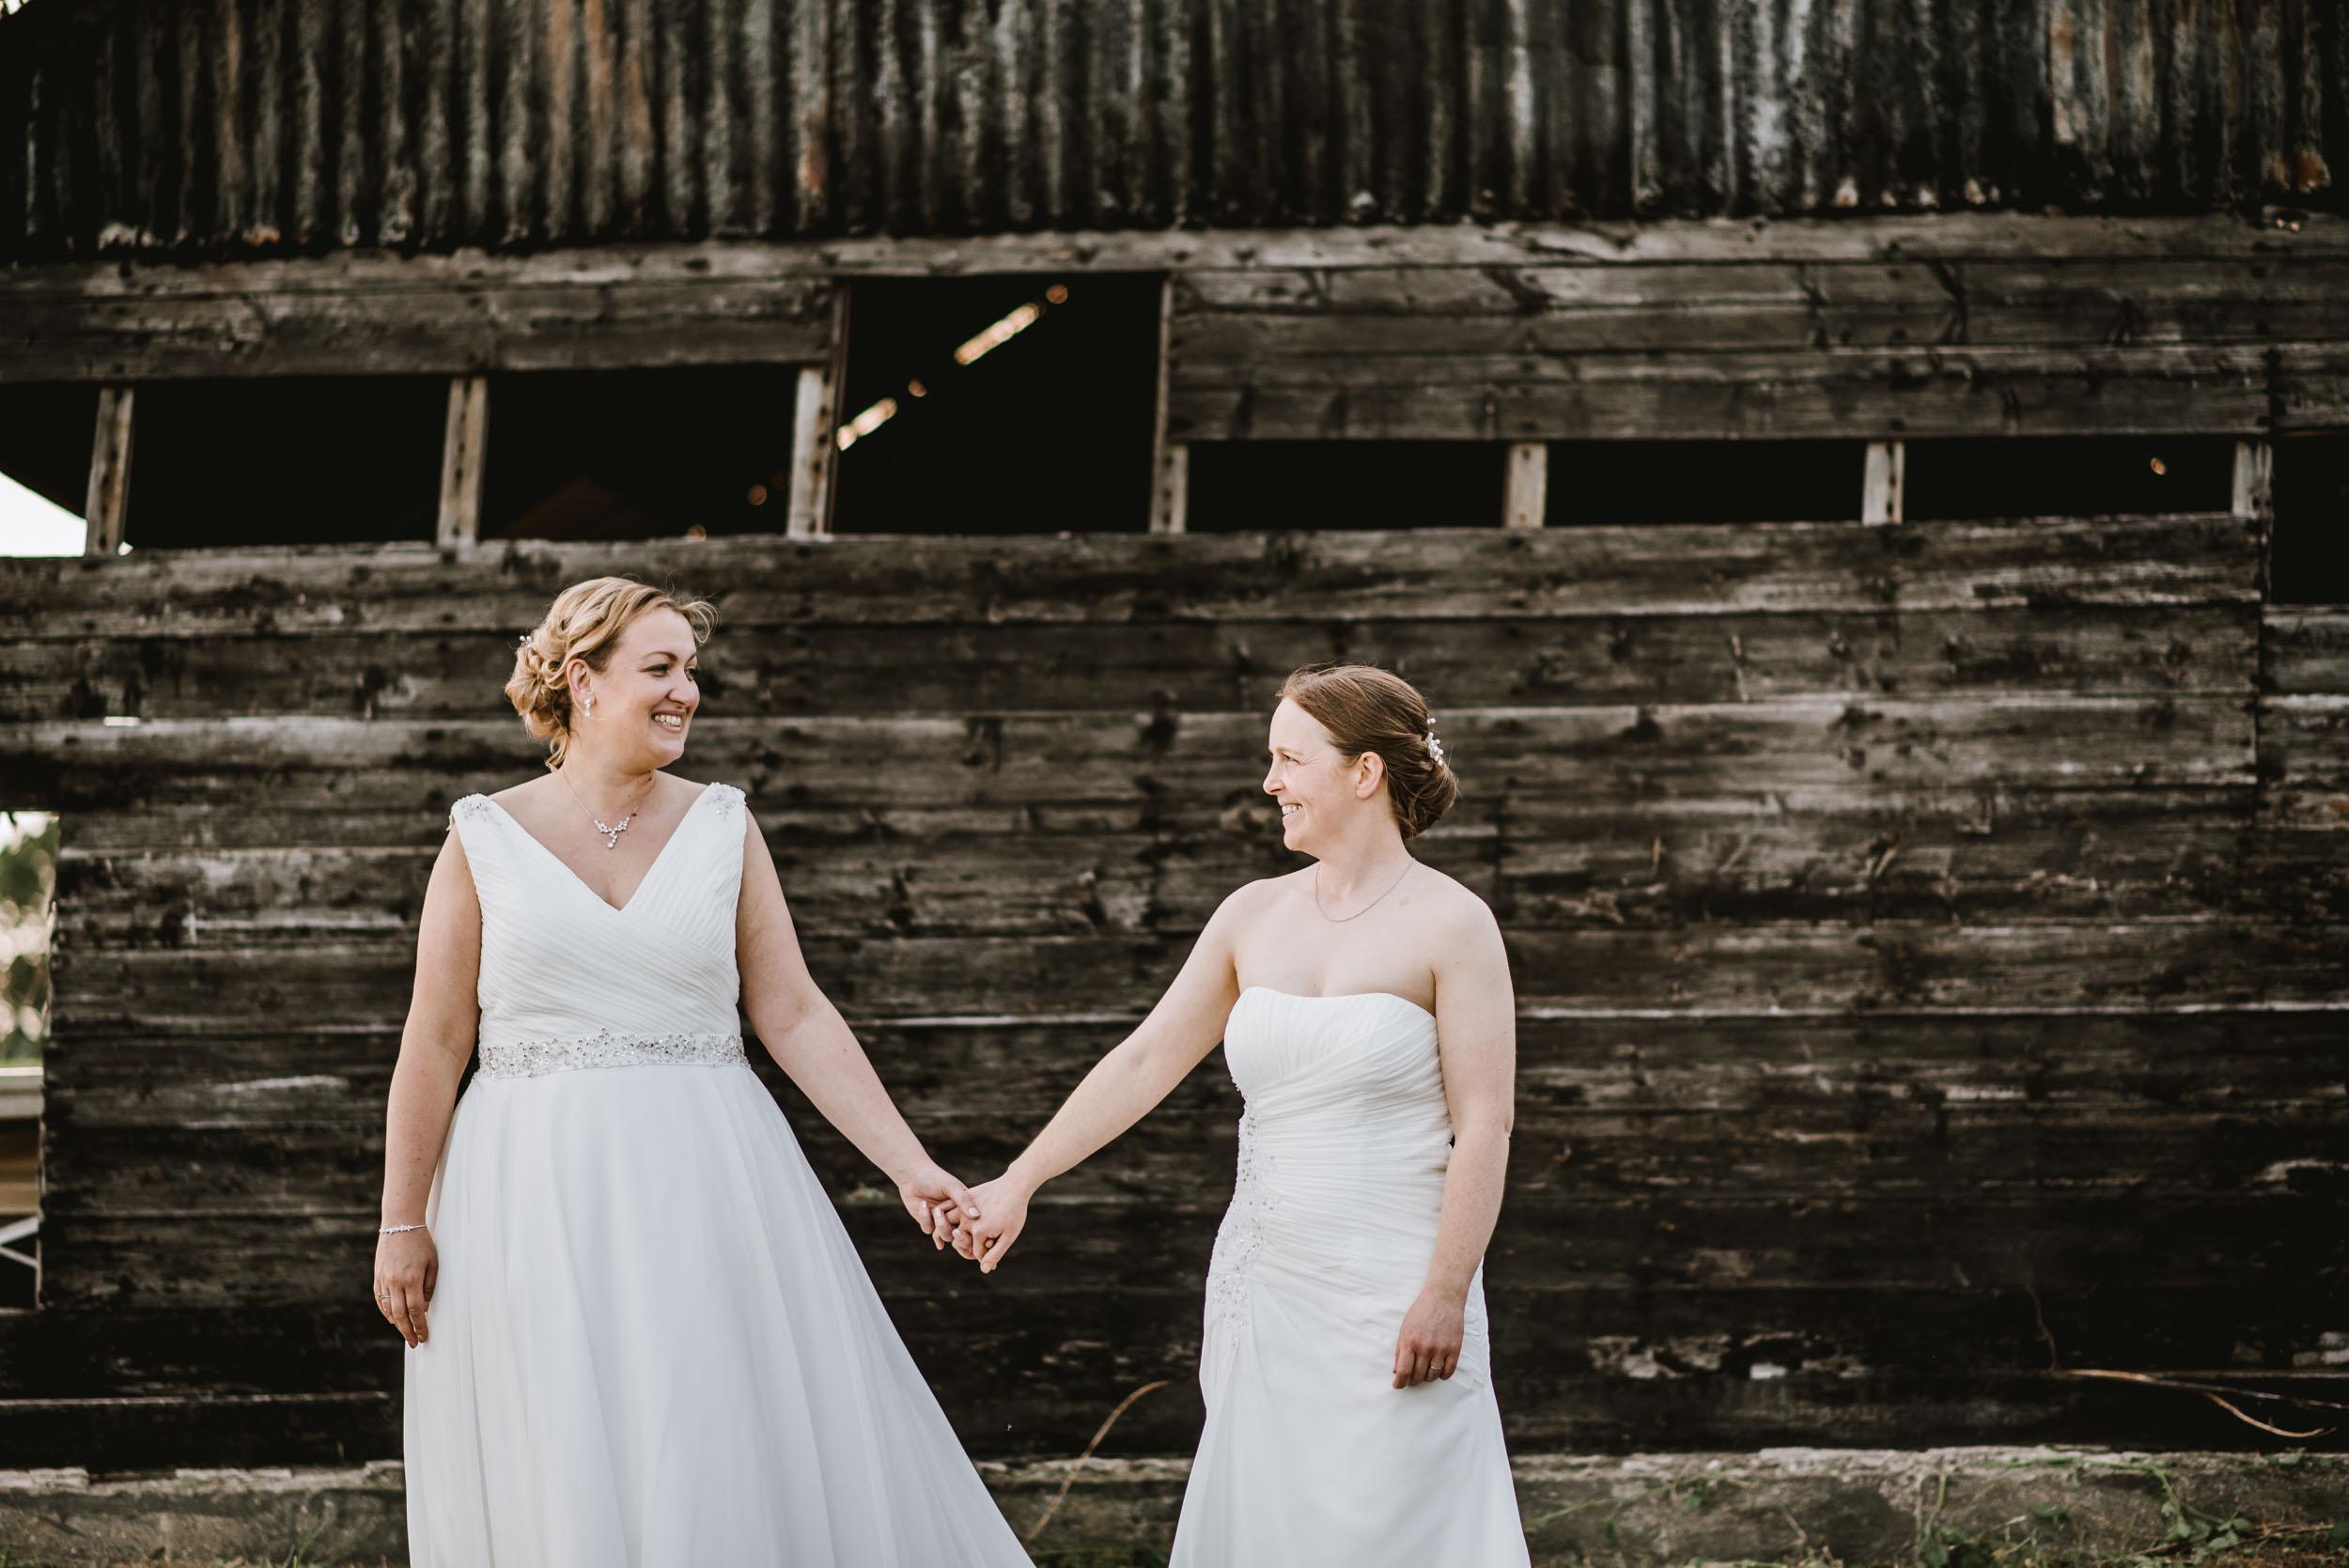 Donington-park-farm-wedding-photography-642.jpg